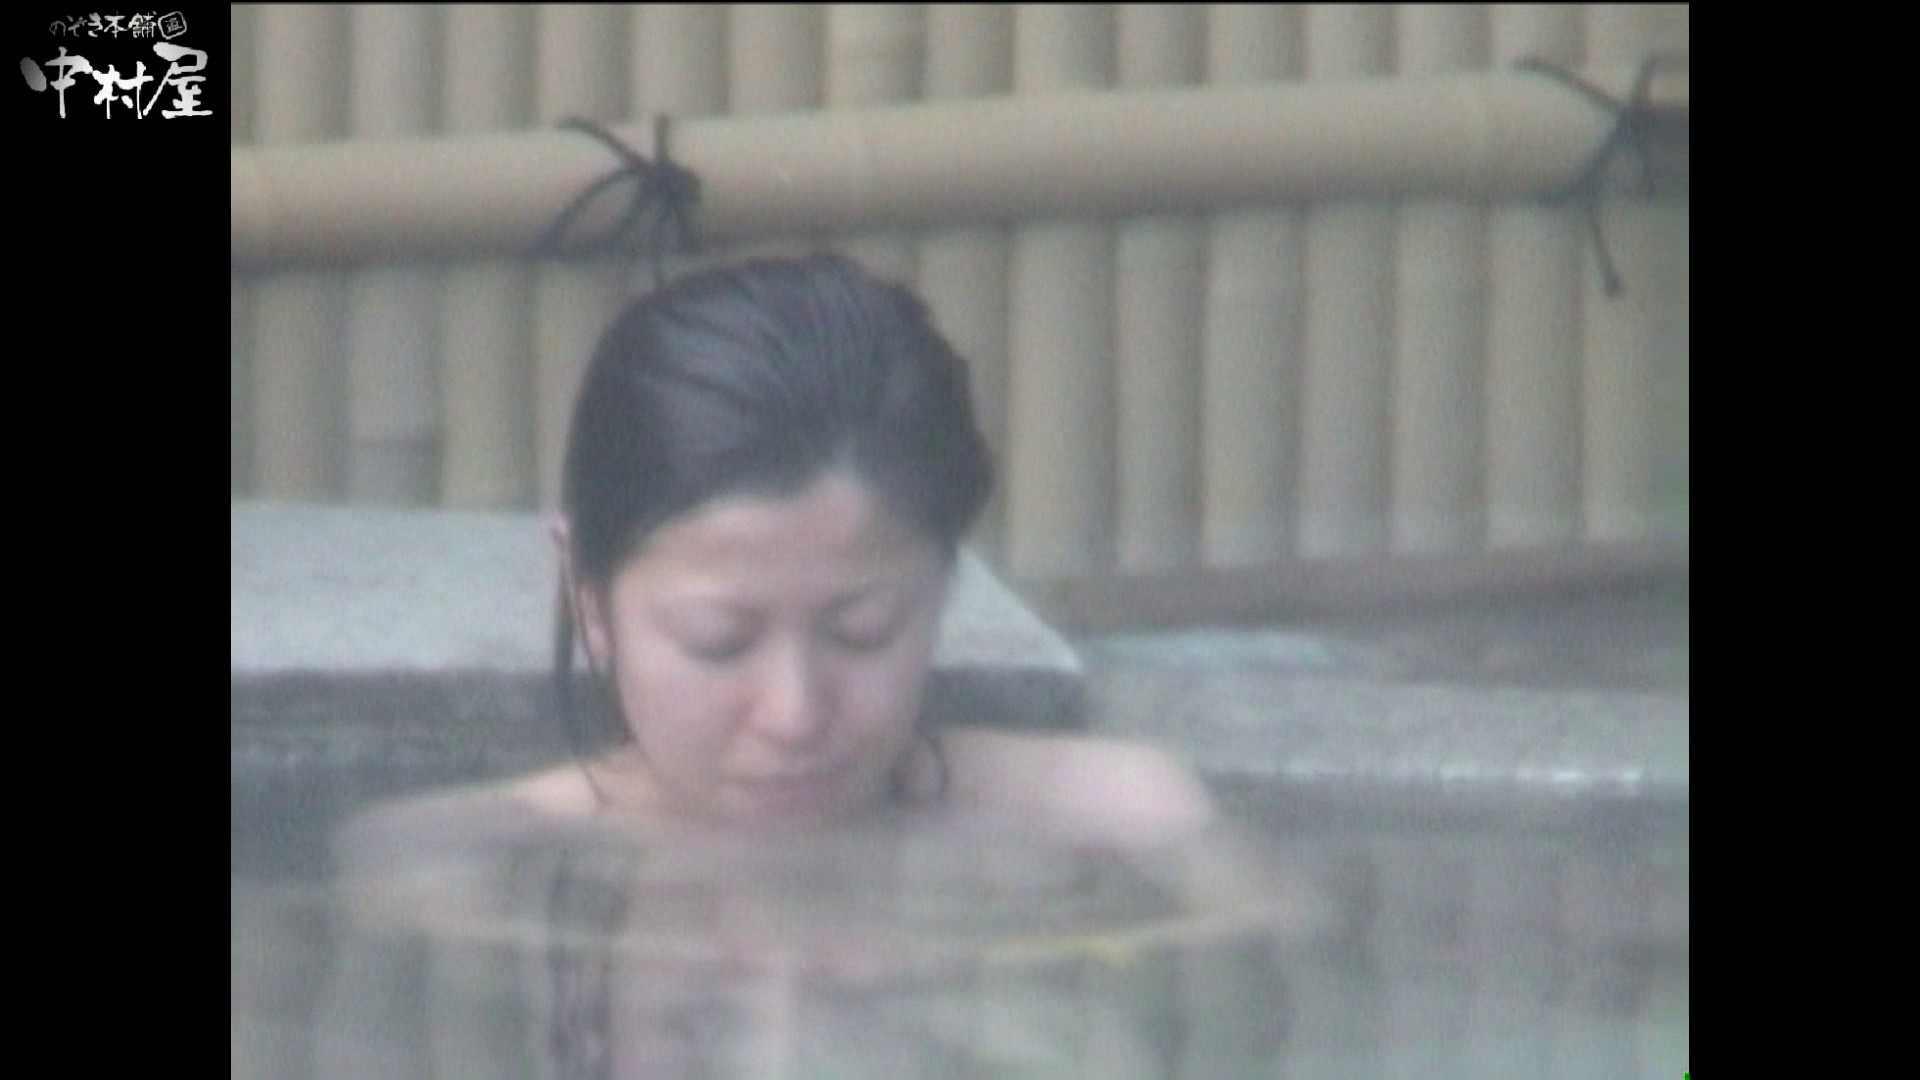 Aquaな露天風呂Vol.986 露天 | OLのプライベート  13pic 13